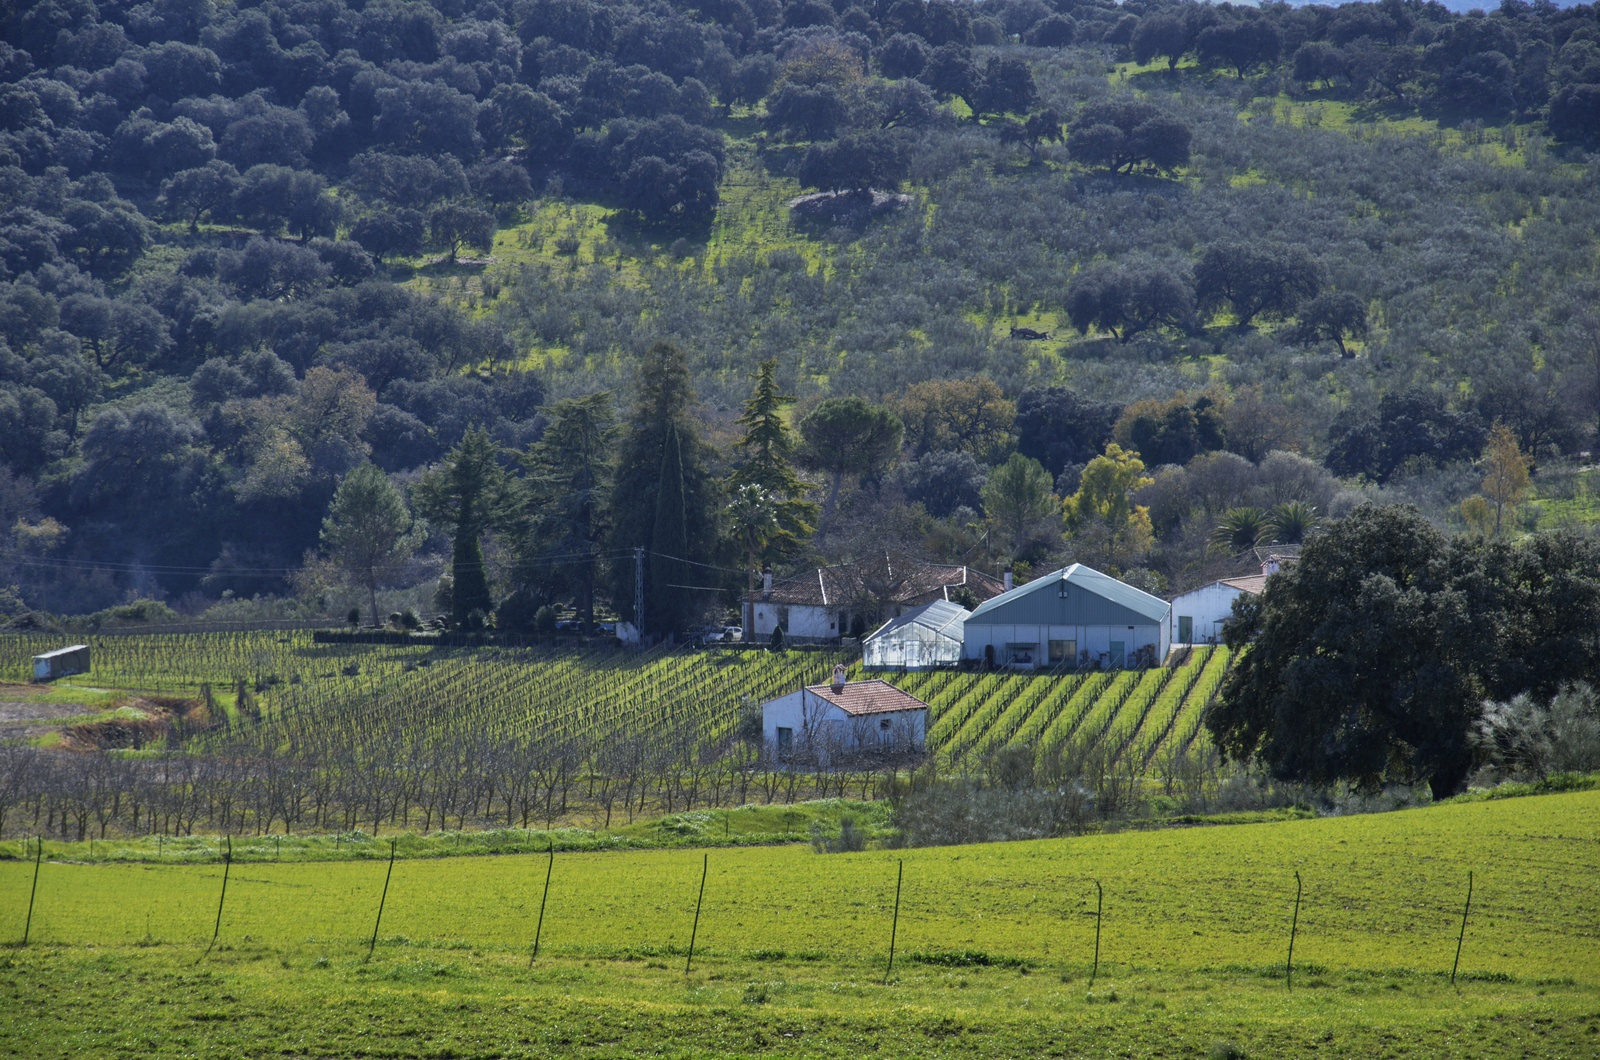 Bodega F. Schatz vineyard landscape in Spain